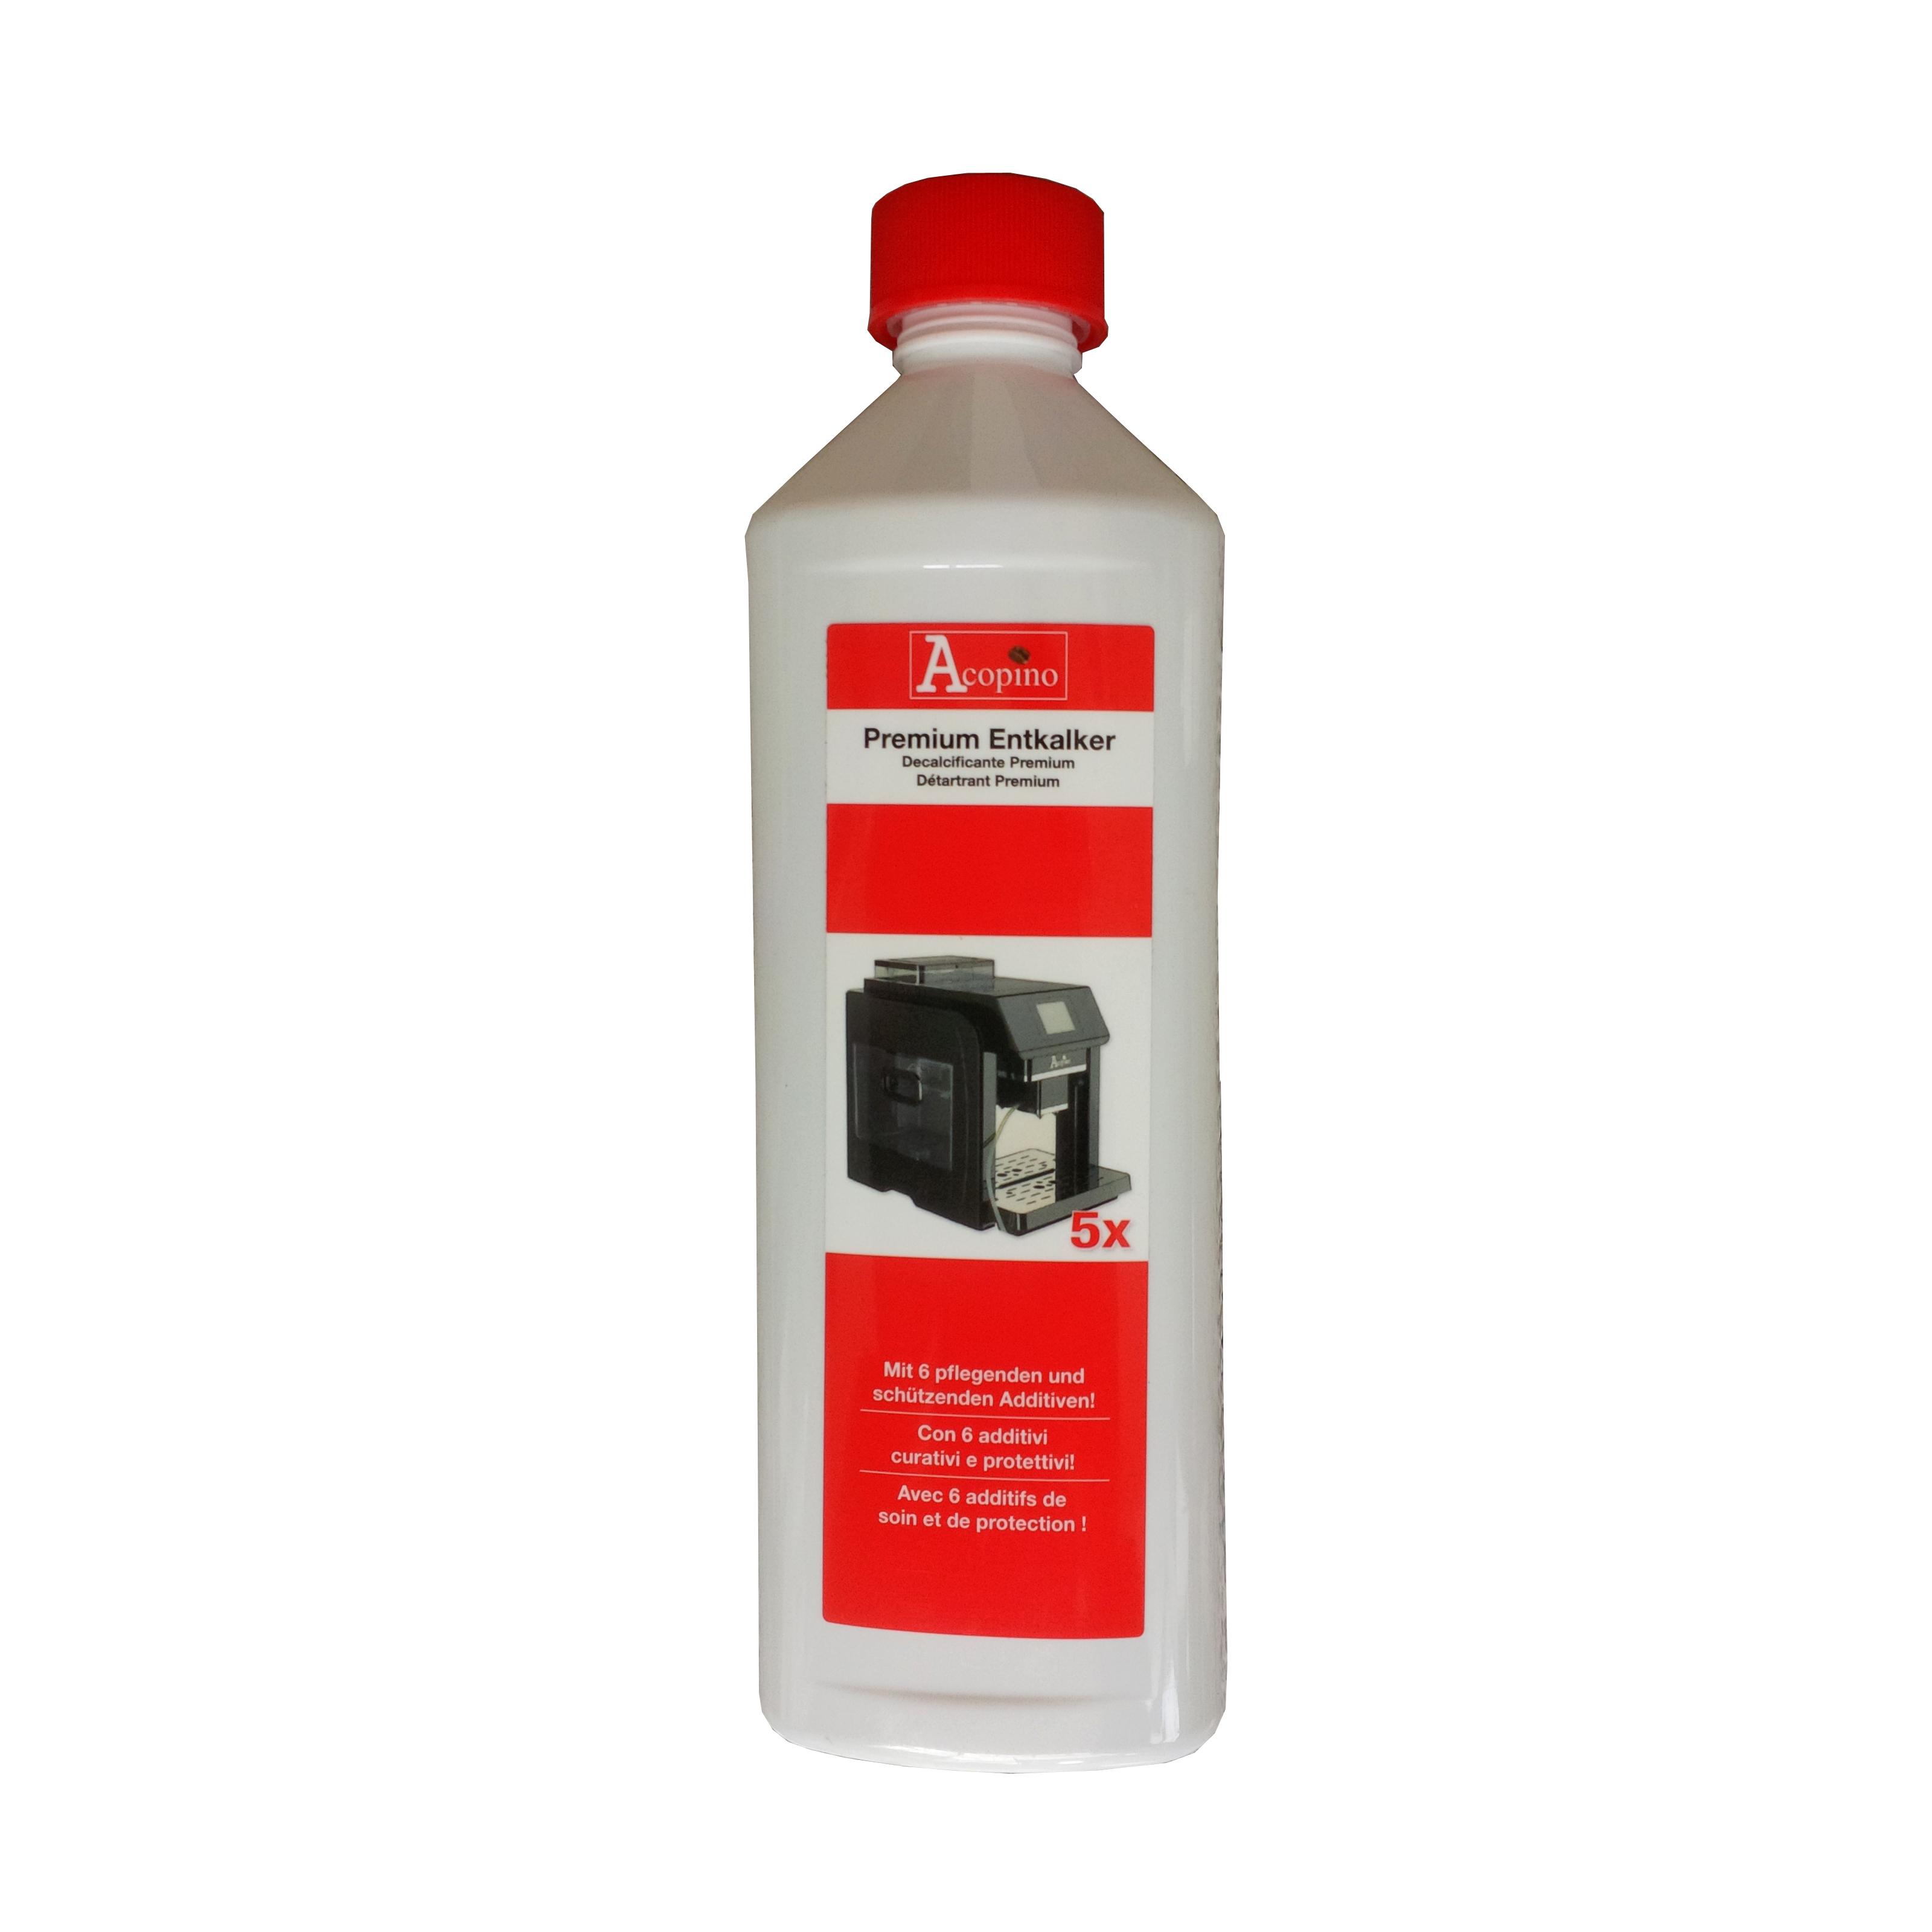 Acopino Premium Entkalker (500ml)